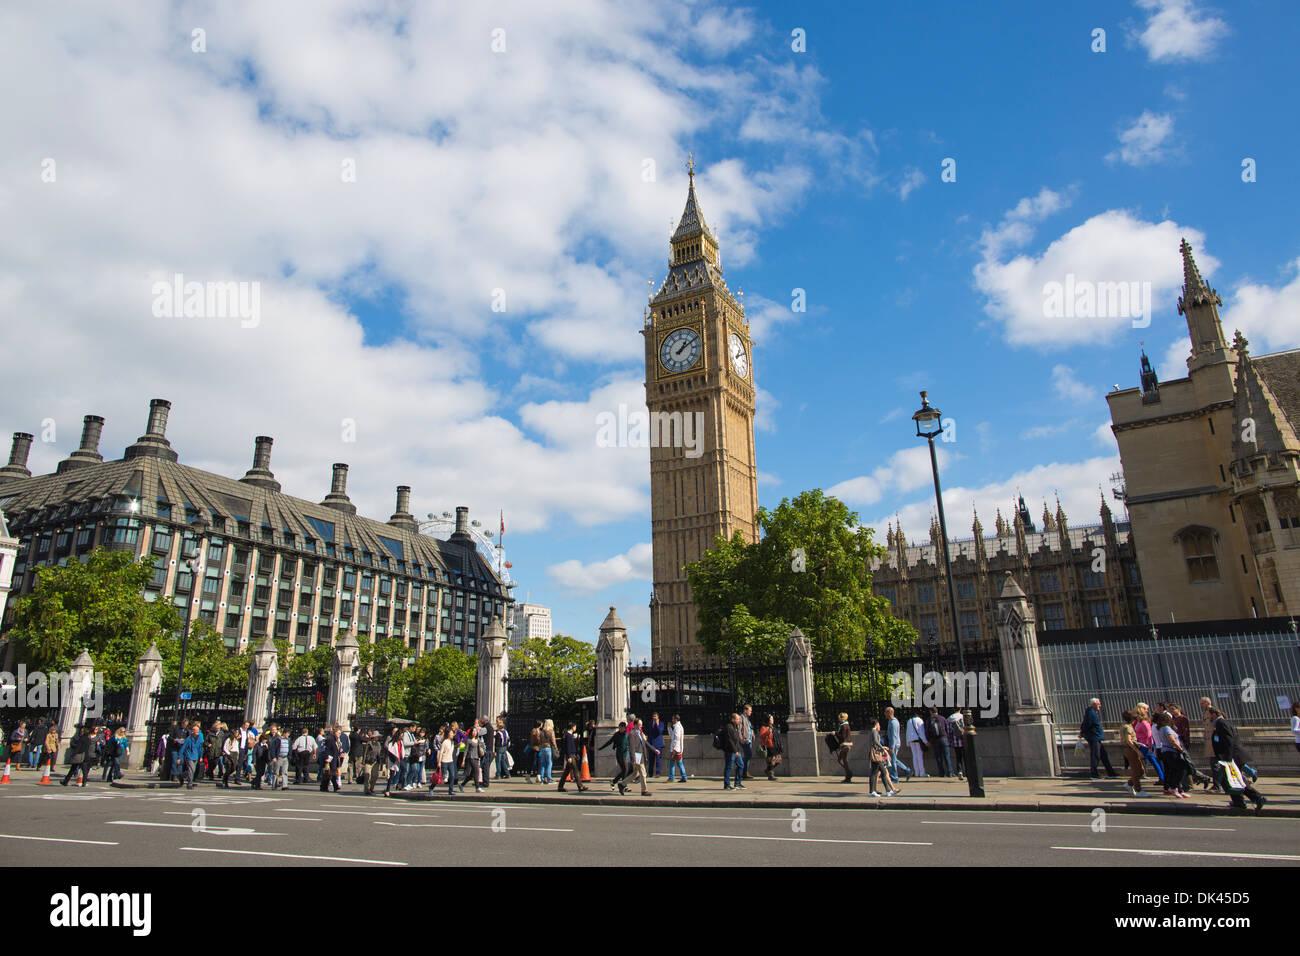 Parliament Square, Central London mit Portcullis House (links) und Big Ben (Mitte), London, UK Stockfoto